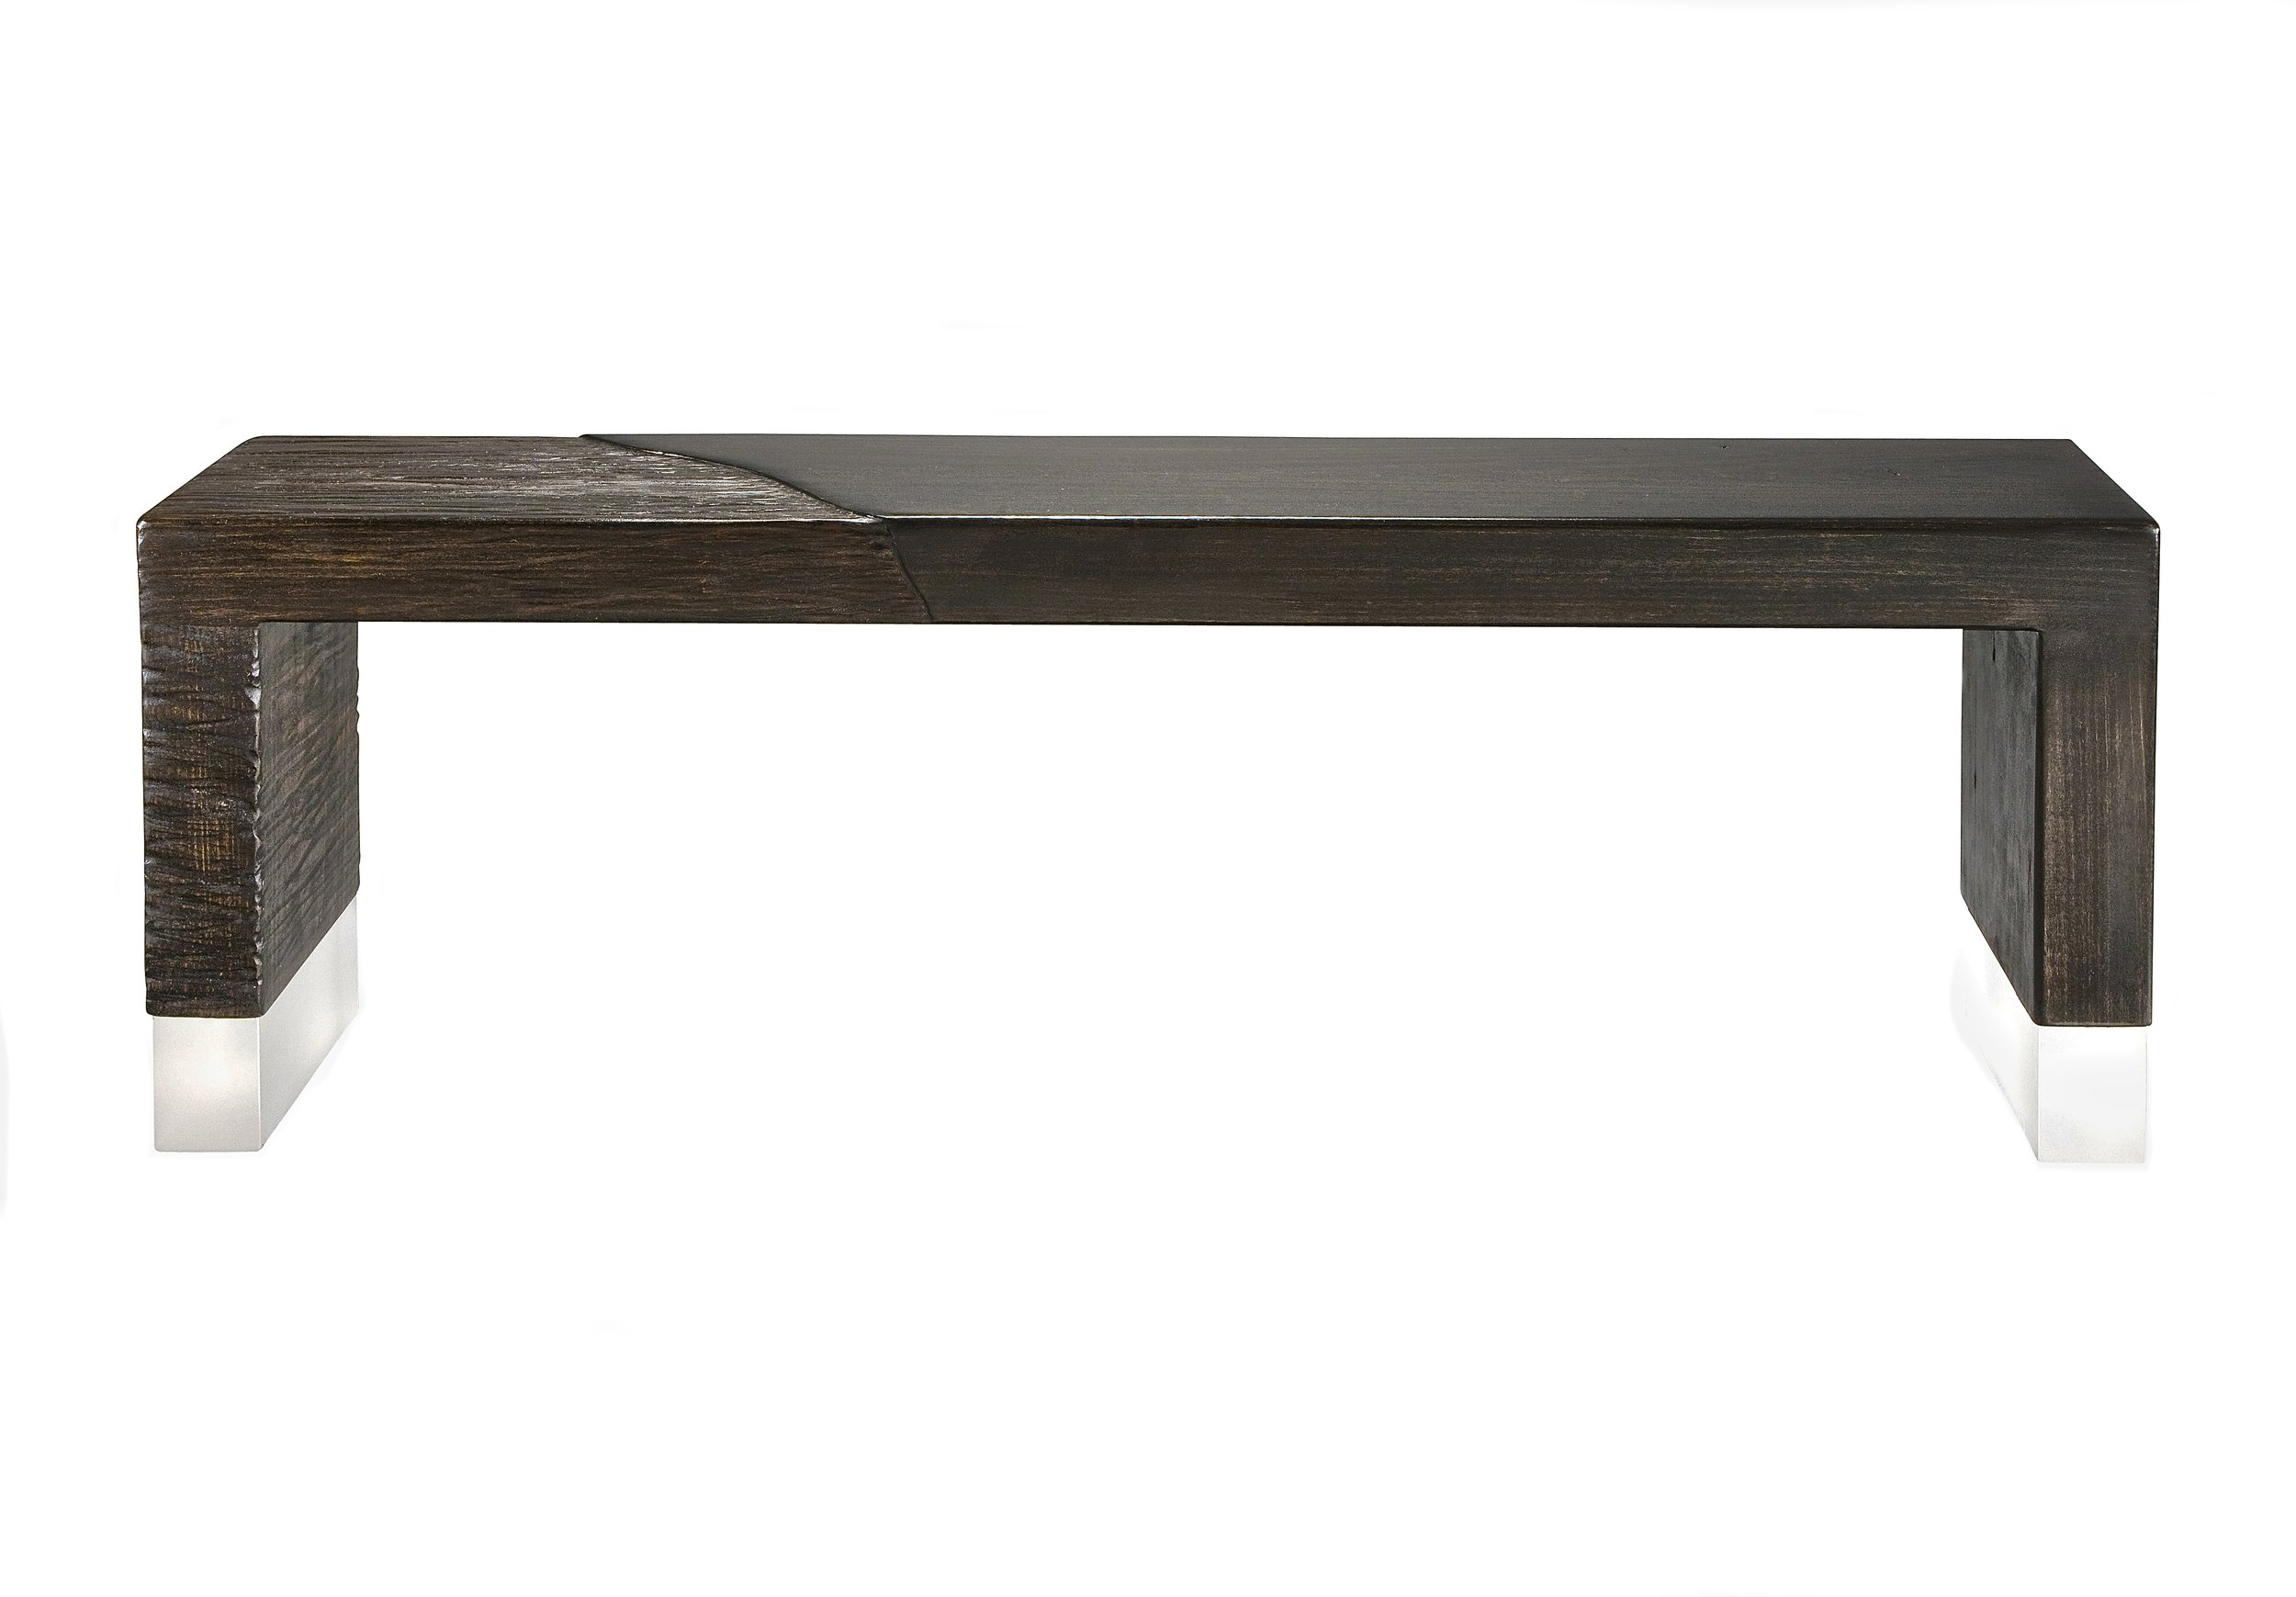 Alluvium Bench